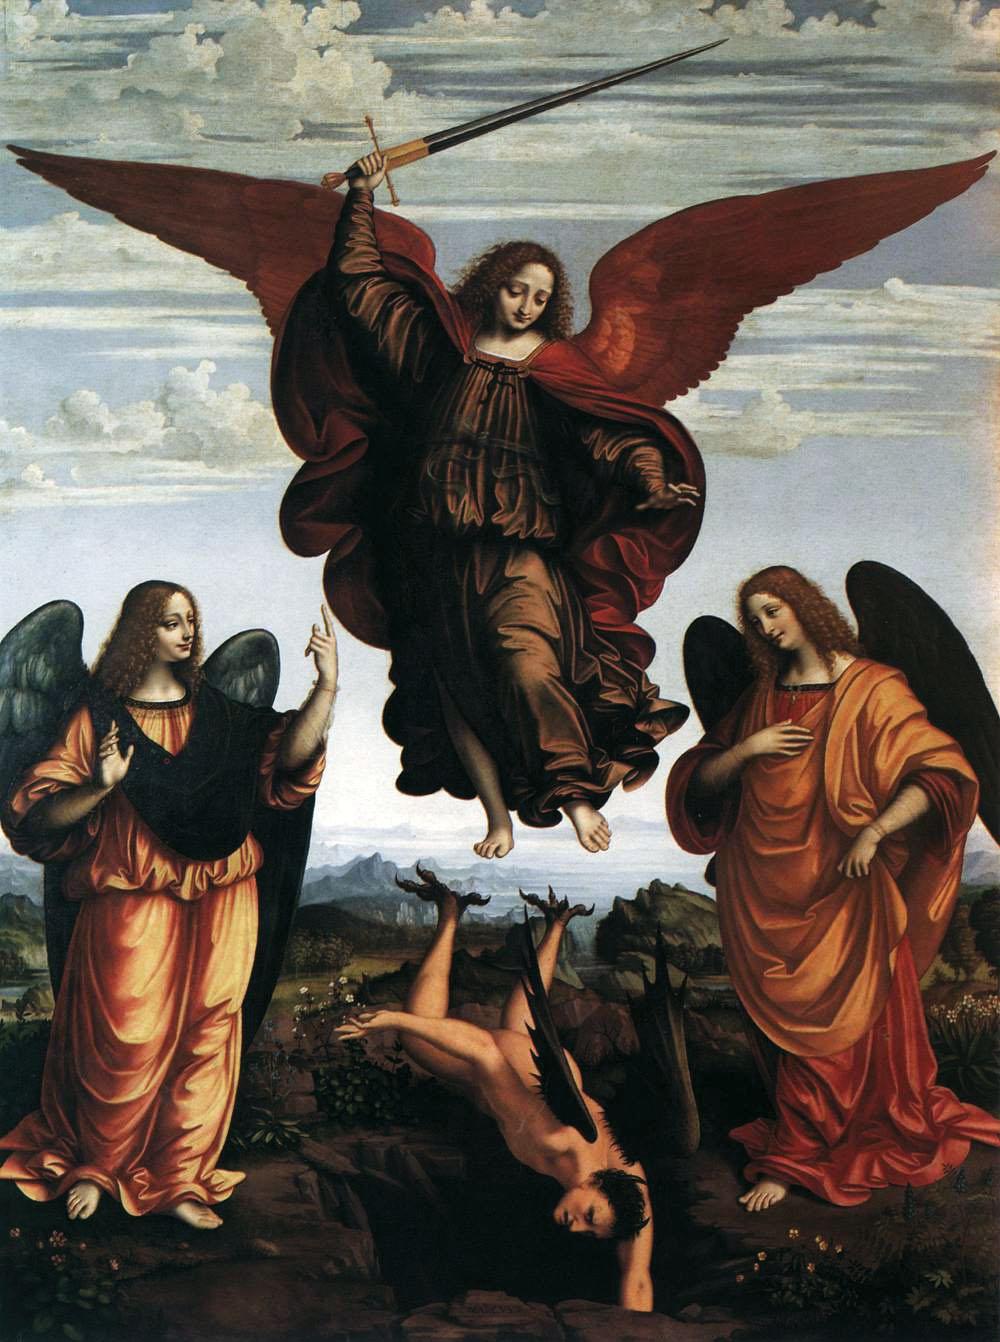 Sette arcangeli - Wikipedia